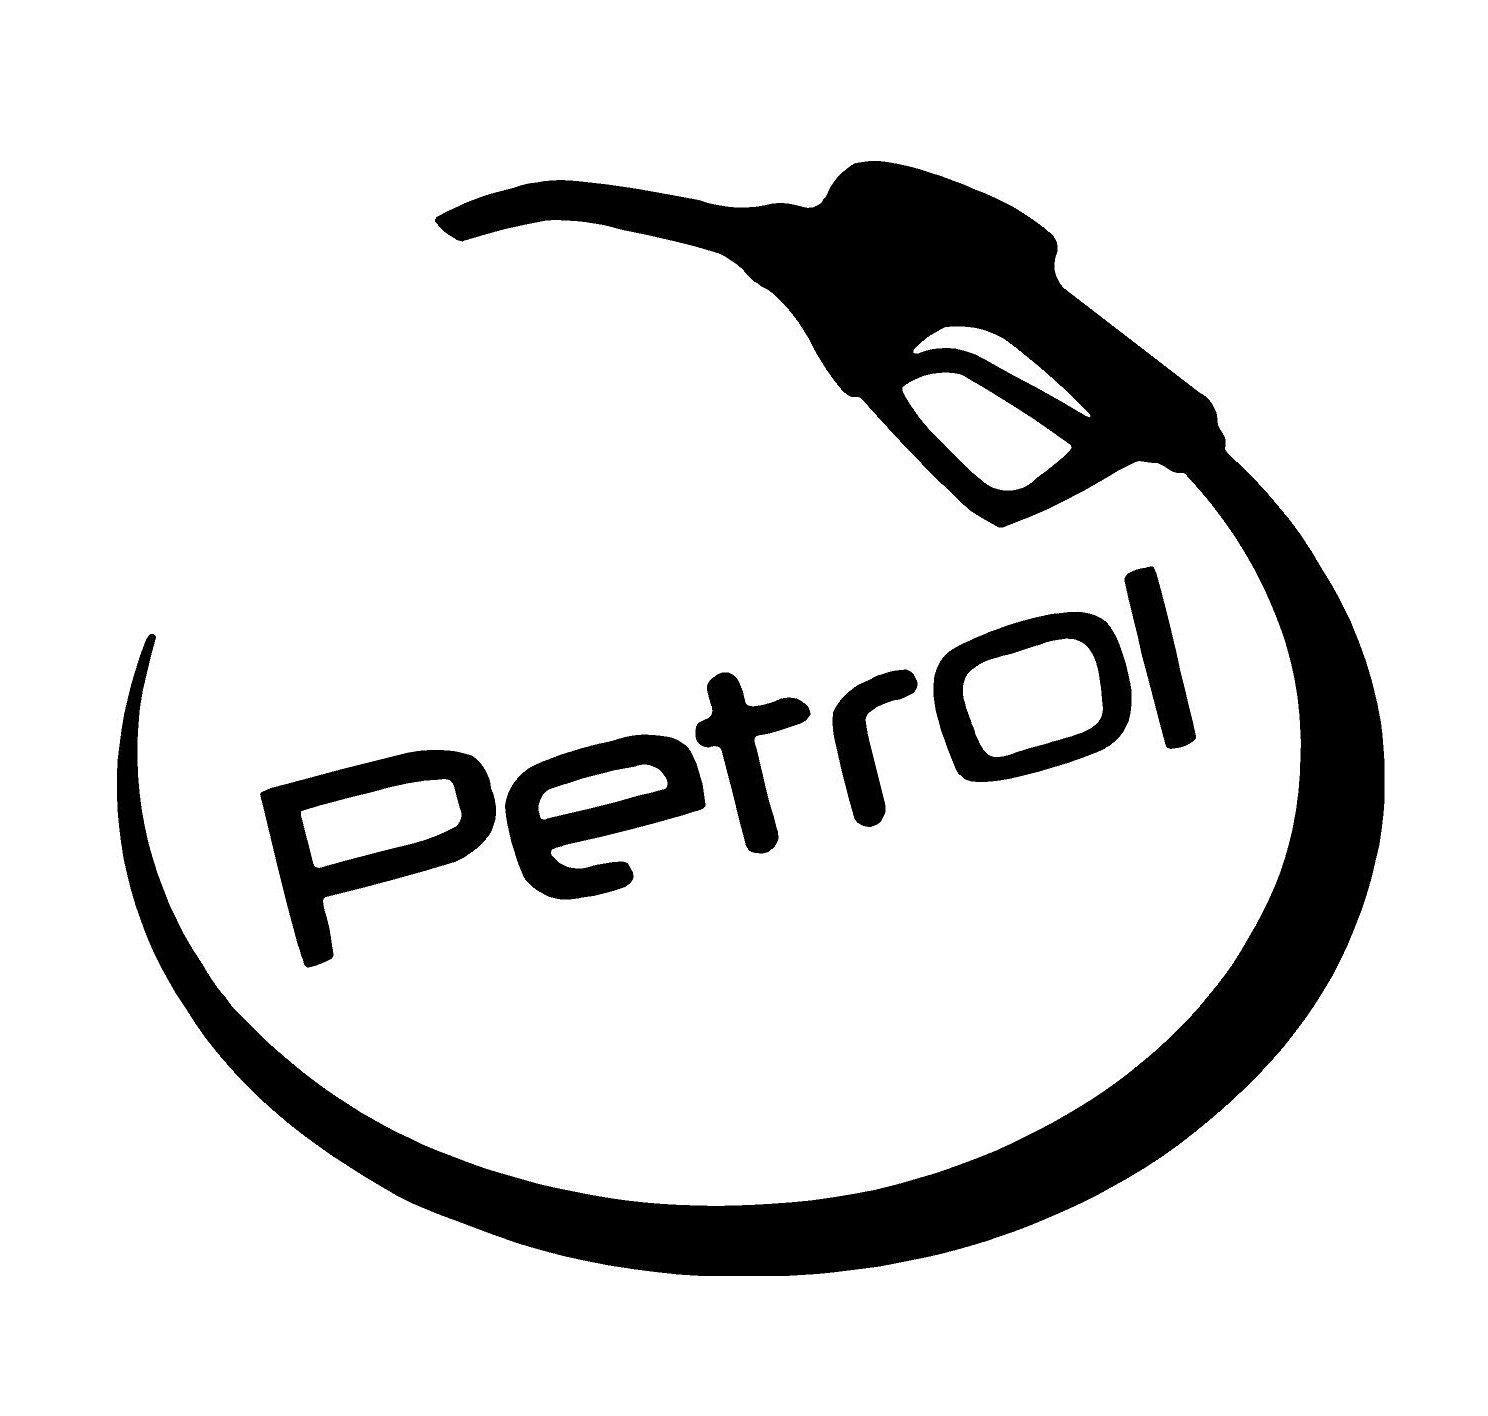 Cvanu petrol fuel lid side car sticker for maruti suzuki wagon r stingray p 8 black amazon in car motorbike